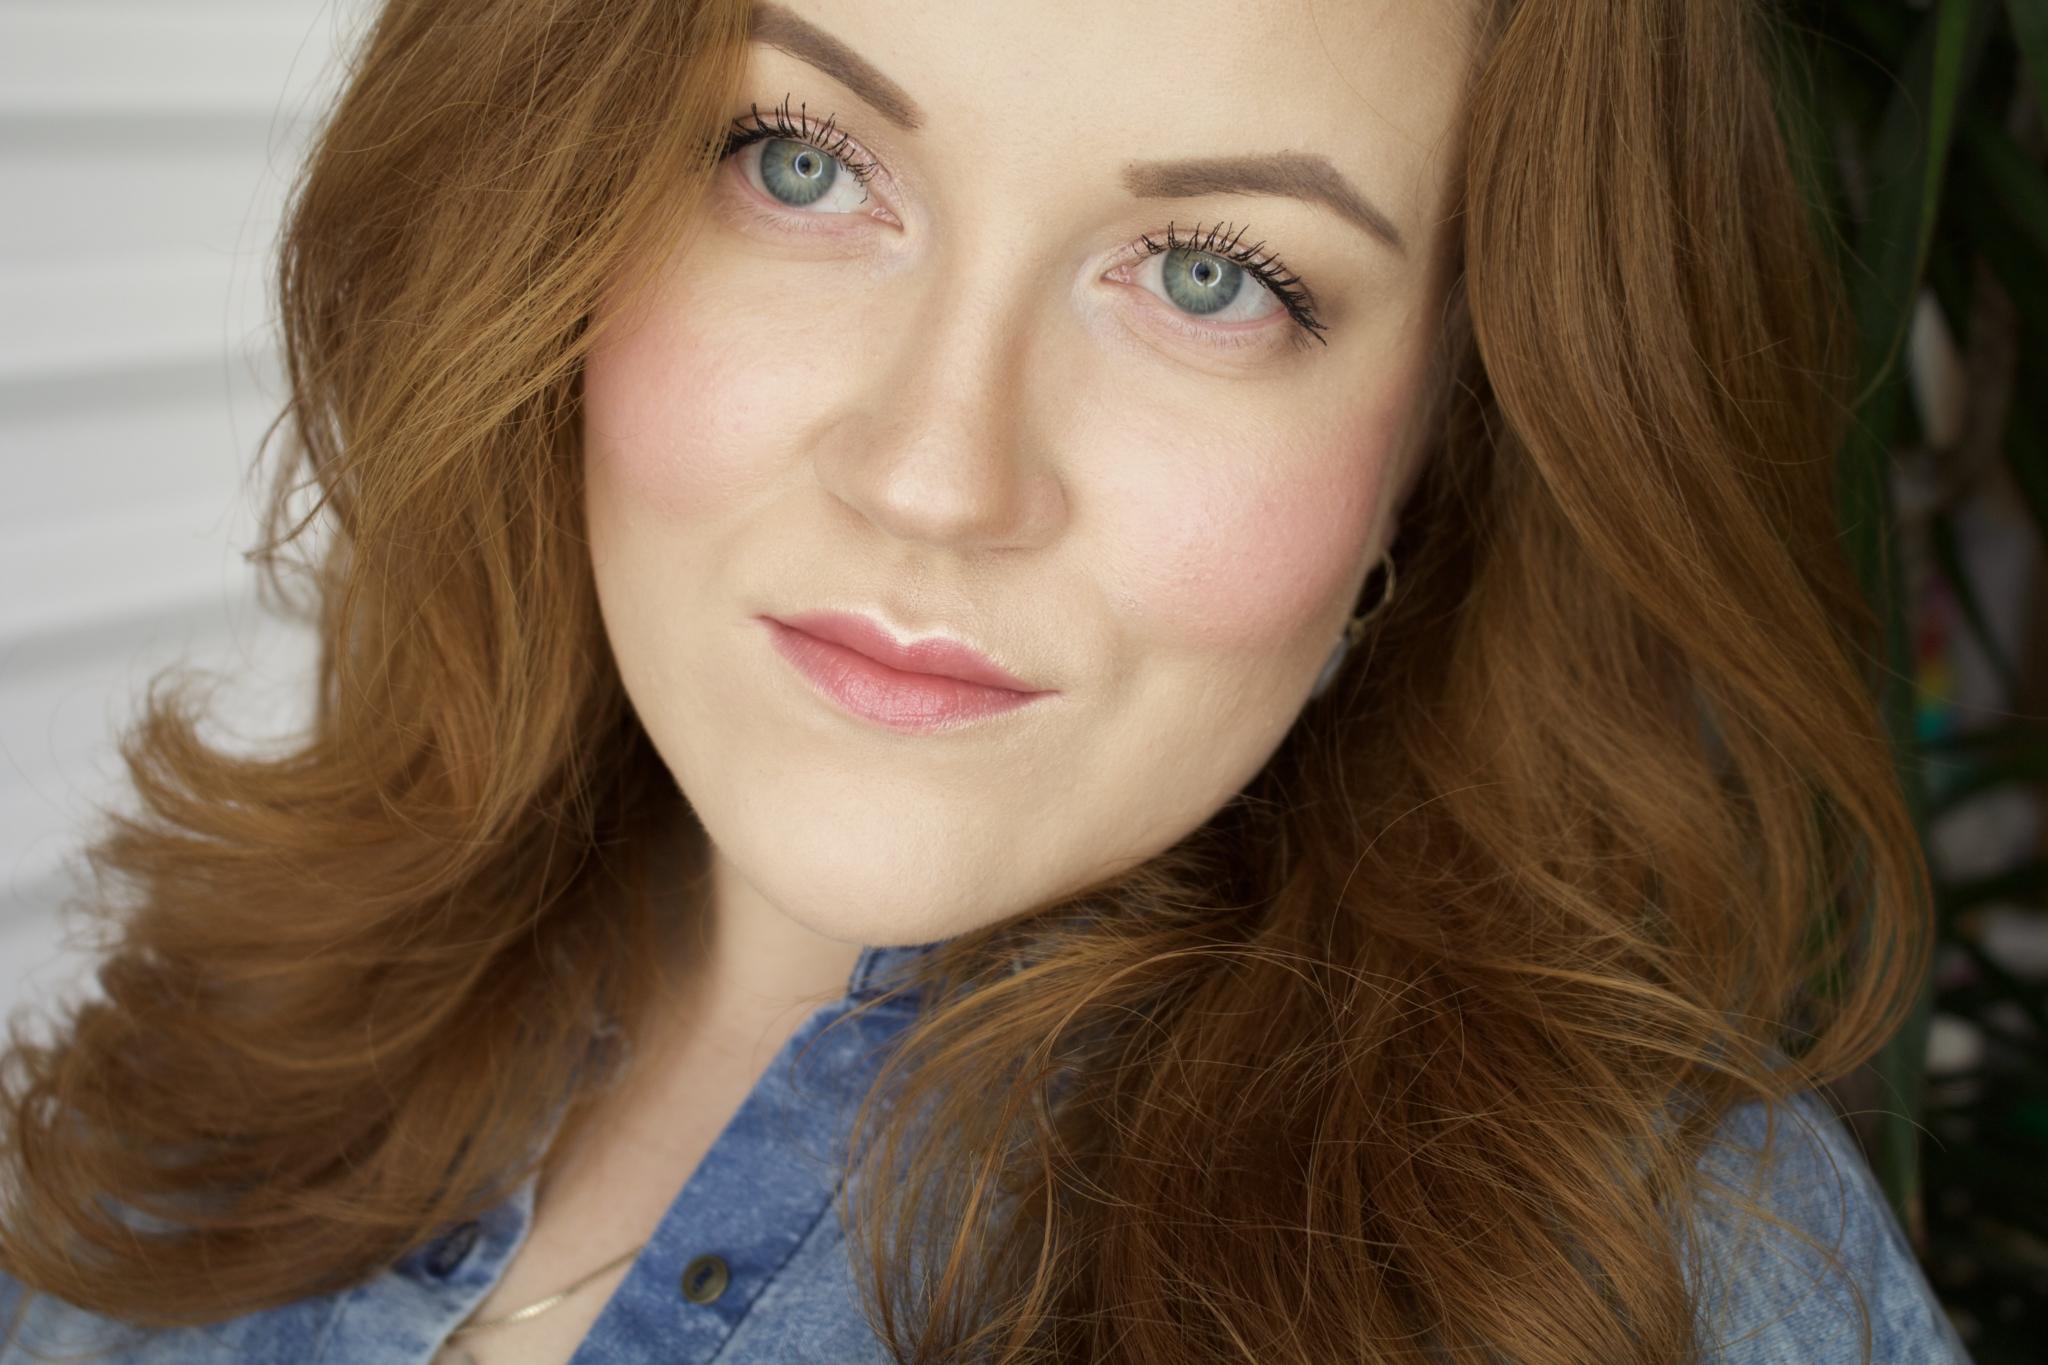 Fertiger Look - Mein Oster Make-up Look: peach & glowy mit Lancome & YSL - Beauty Blog Leipzig